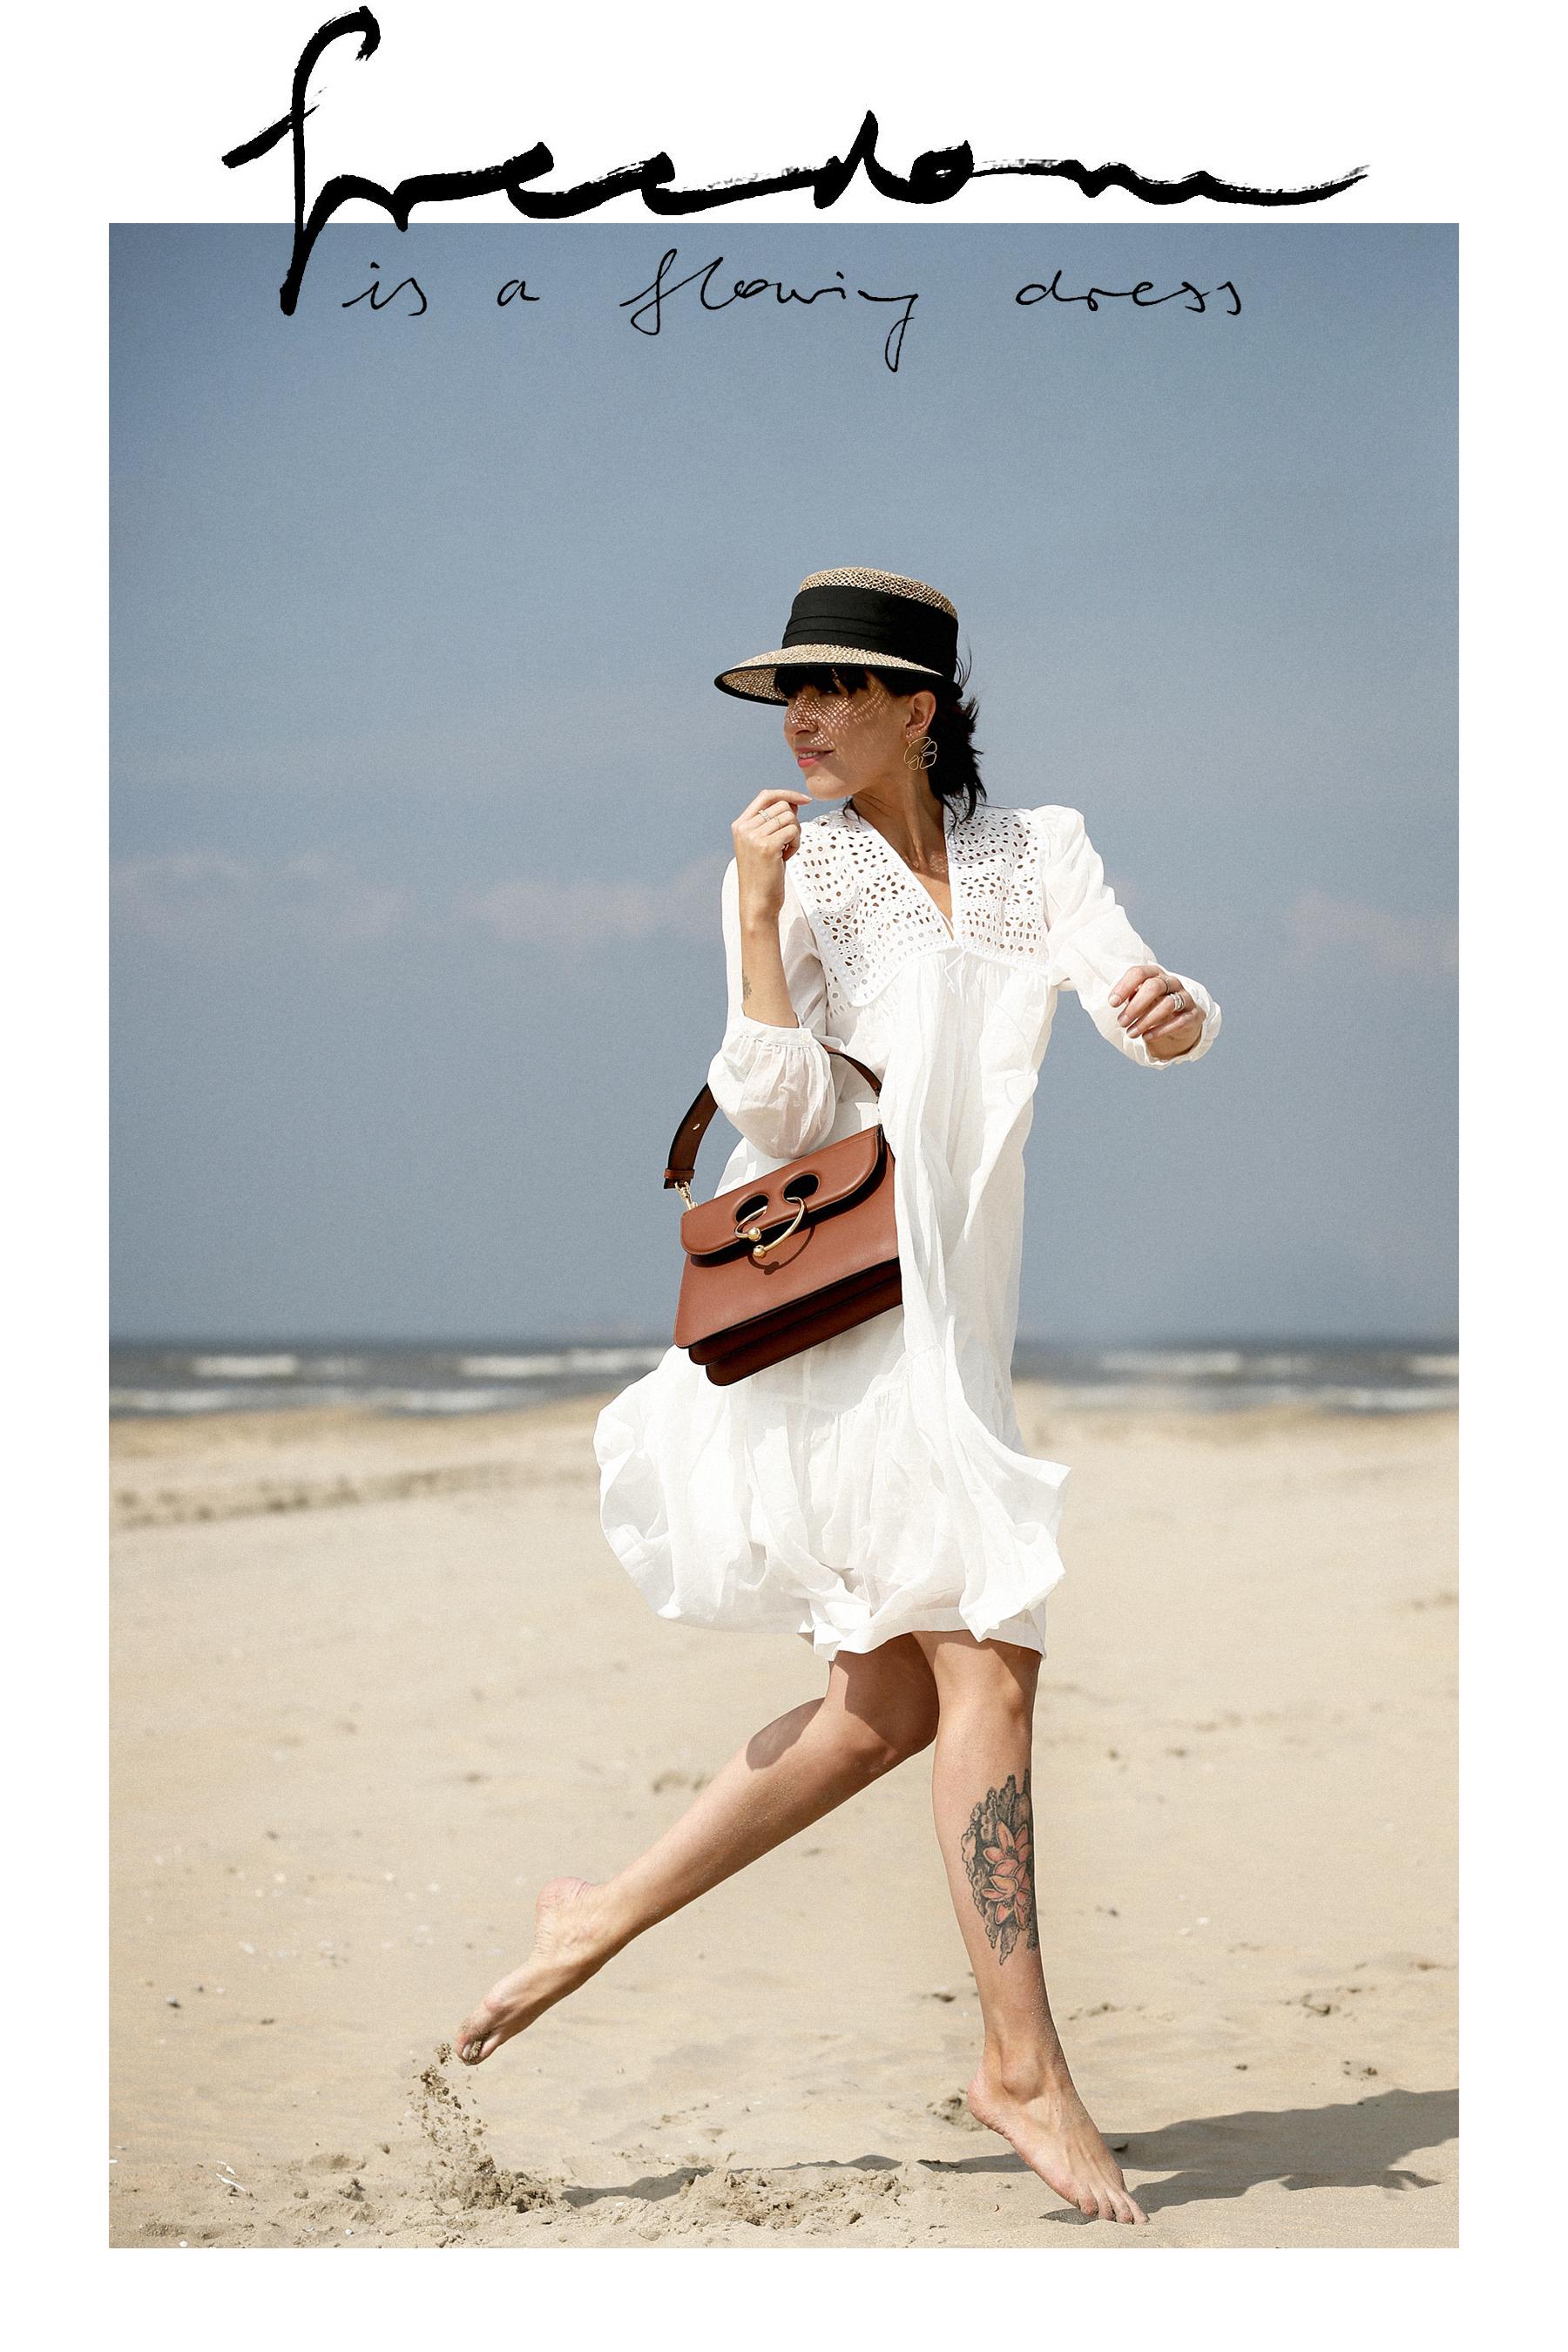 breuninger beach white dress closed j.w.anderson pierce bag straw hat summertime sunshine photography editorial vogue fashionblogger düsseldorf cats&dogs blog ricarda schernus modeblogger 8